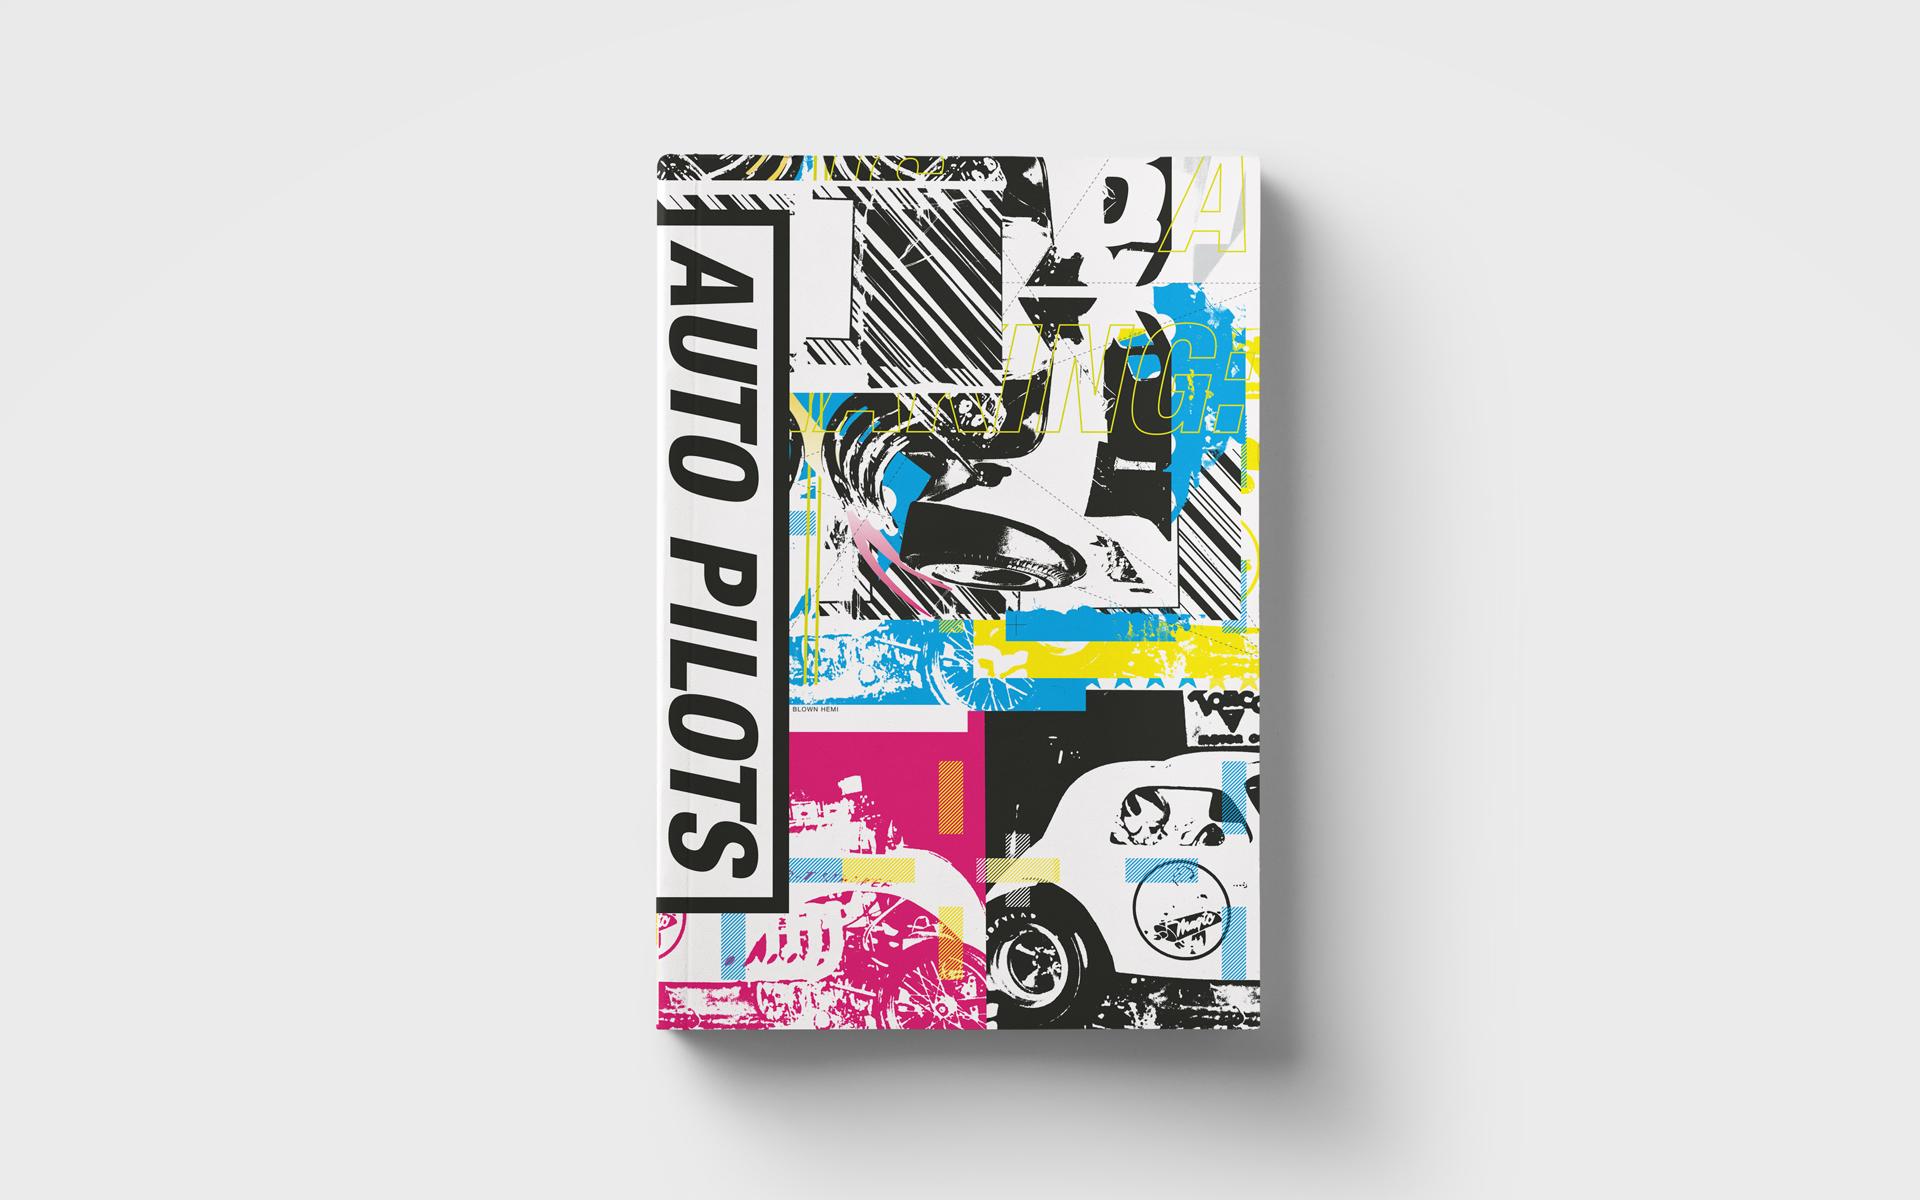 Auto_Pilots_Book_Cover